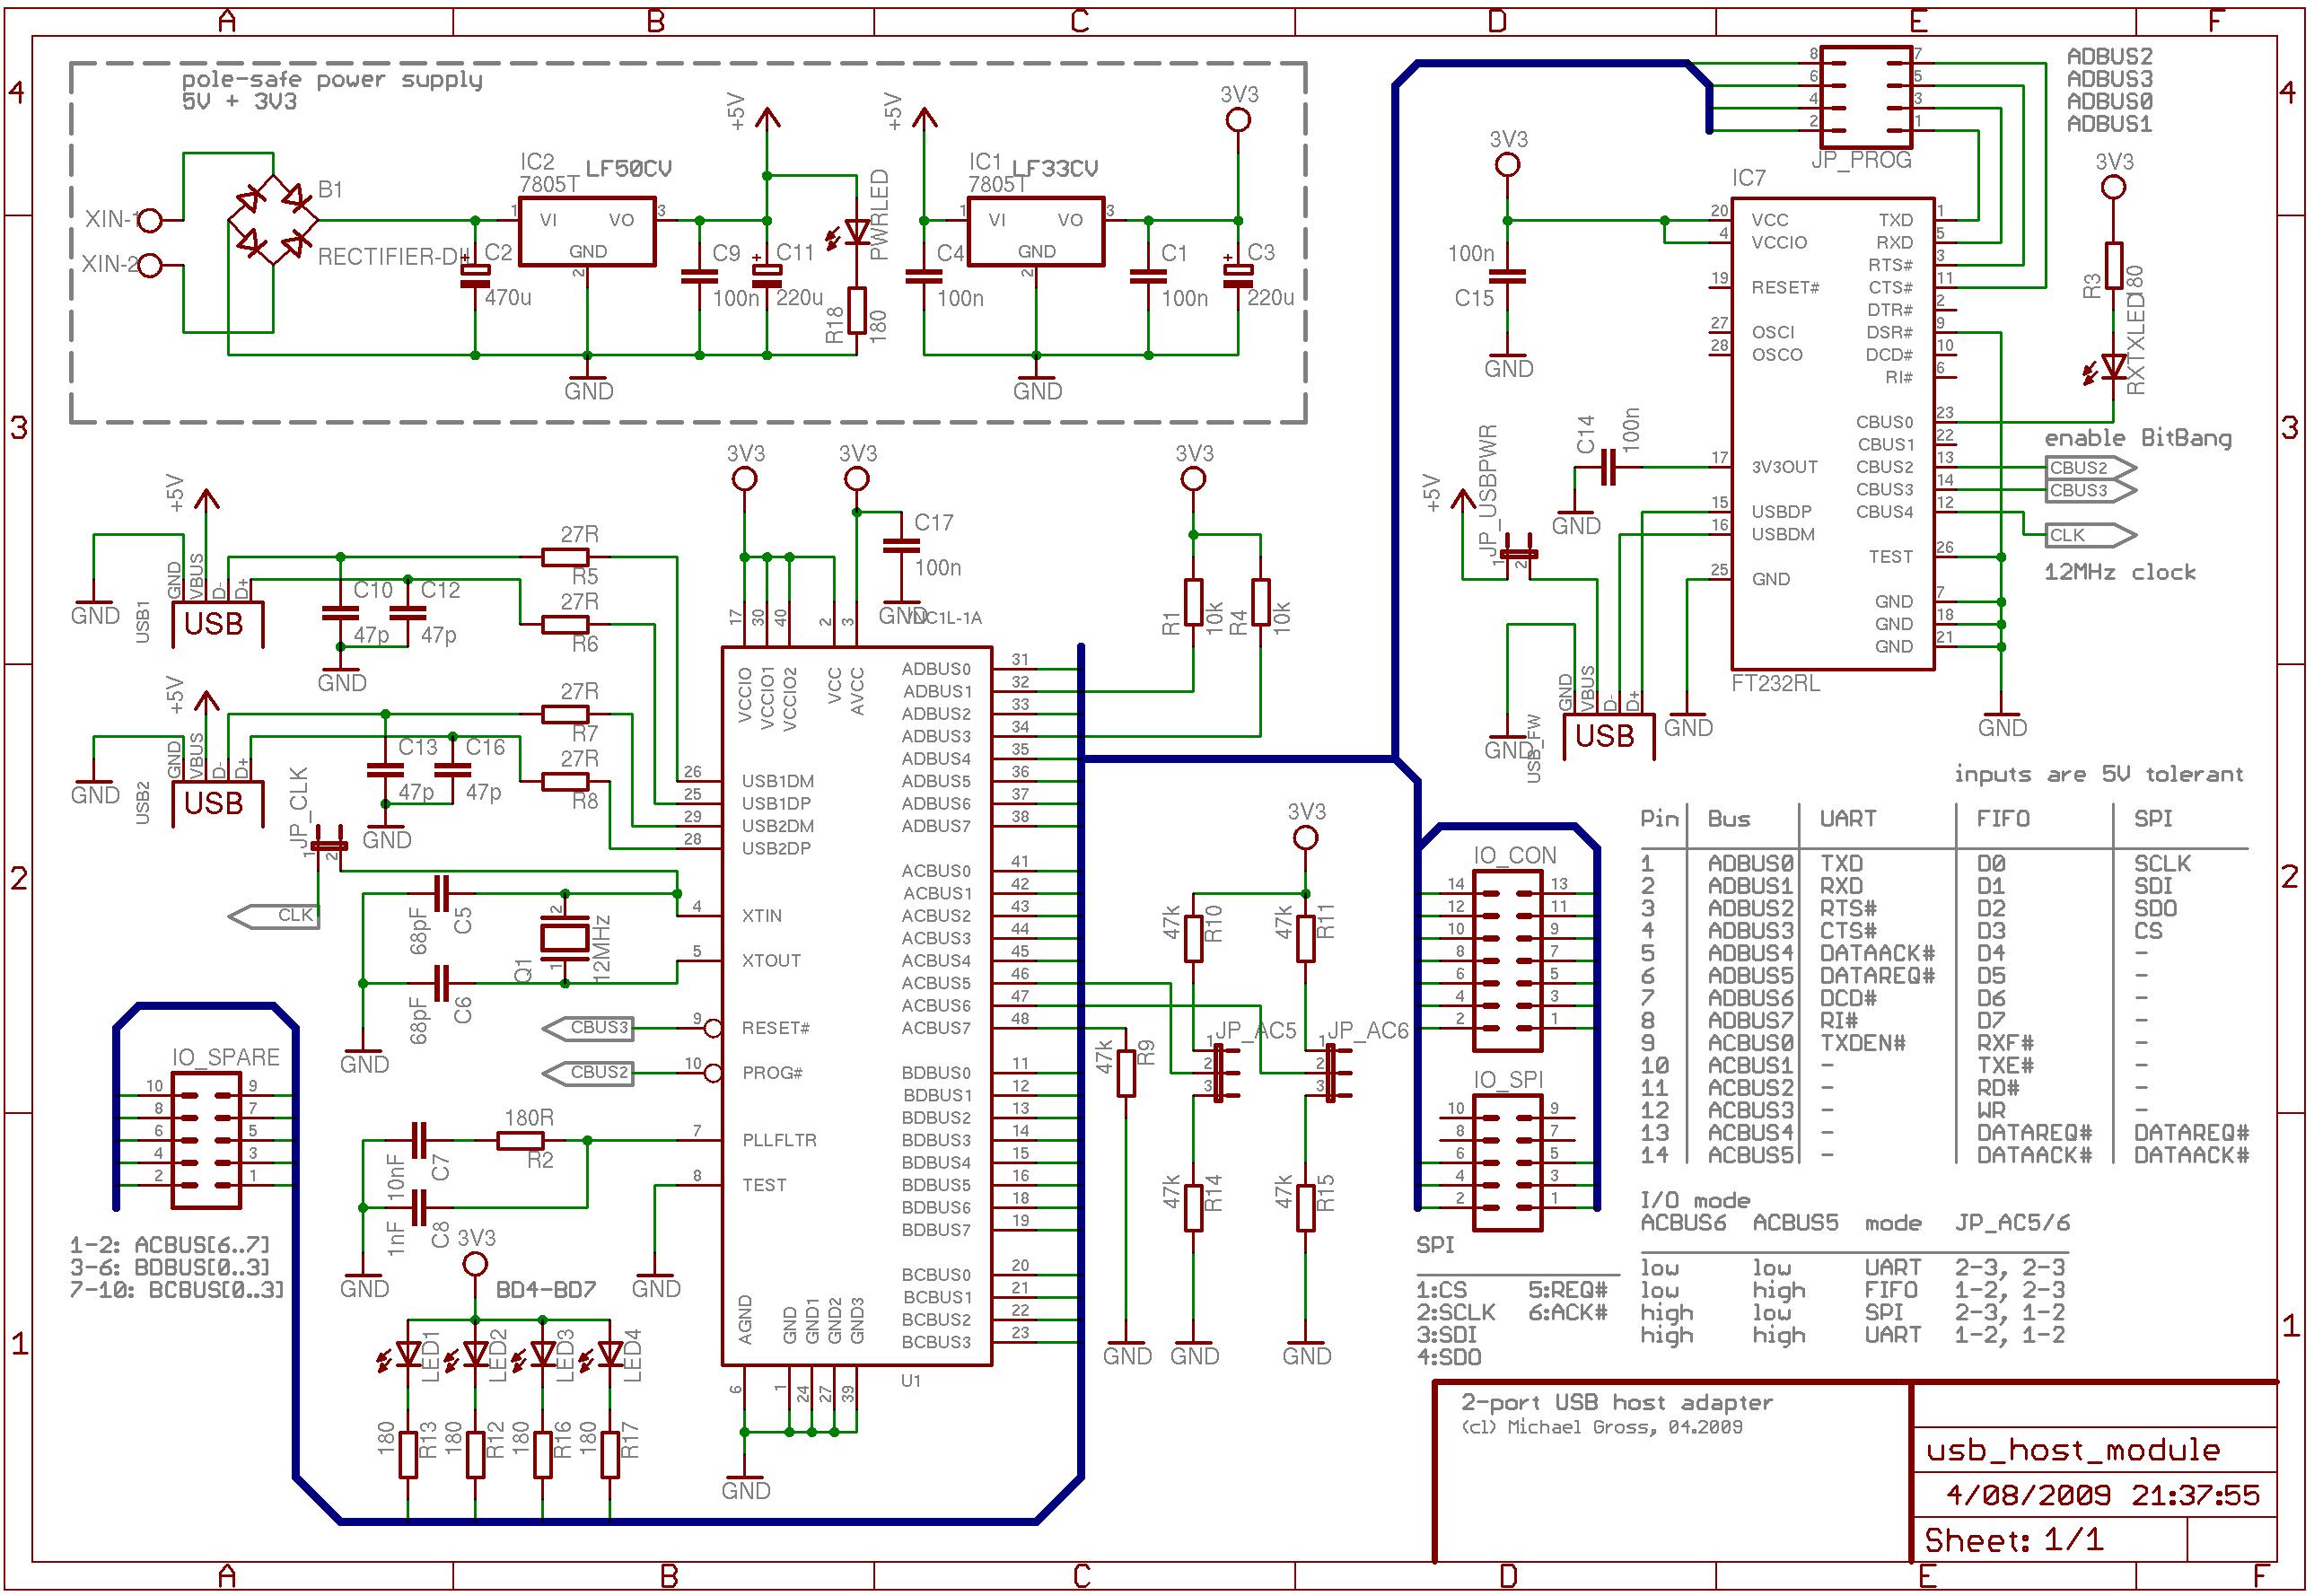 Schaltplan-Review] USB-Host-Modul auf Basis des FTDI Vinculum ...